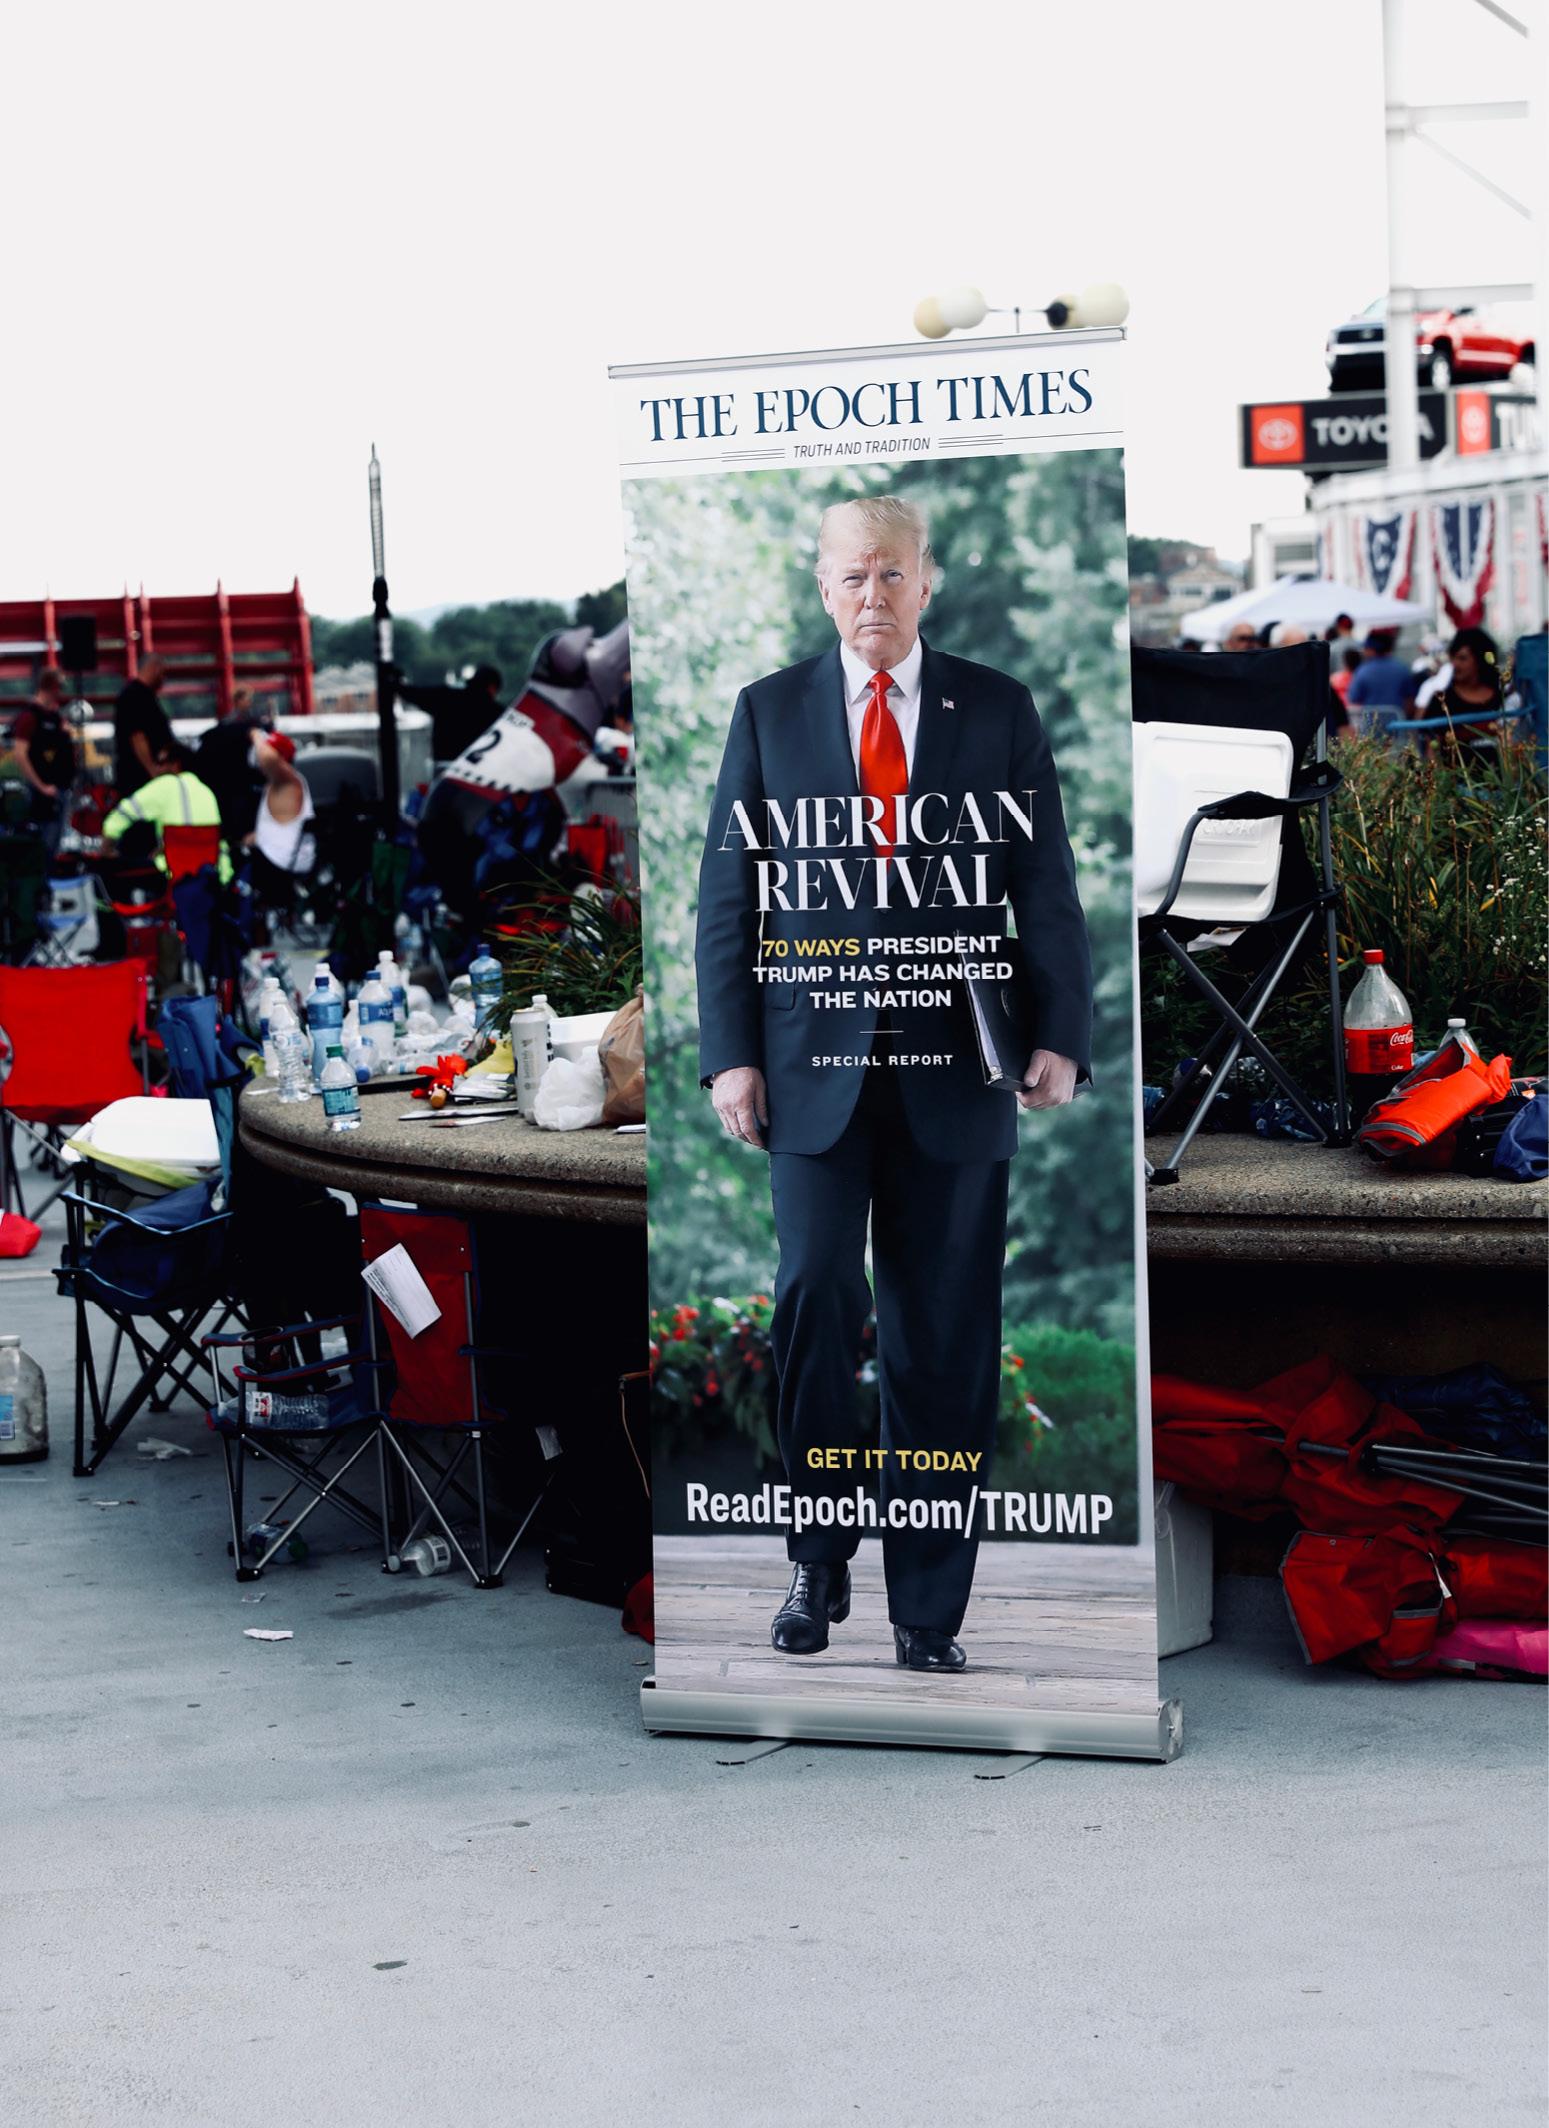 Andy Grant Trump Rally 8.1.19 - II5.jpg